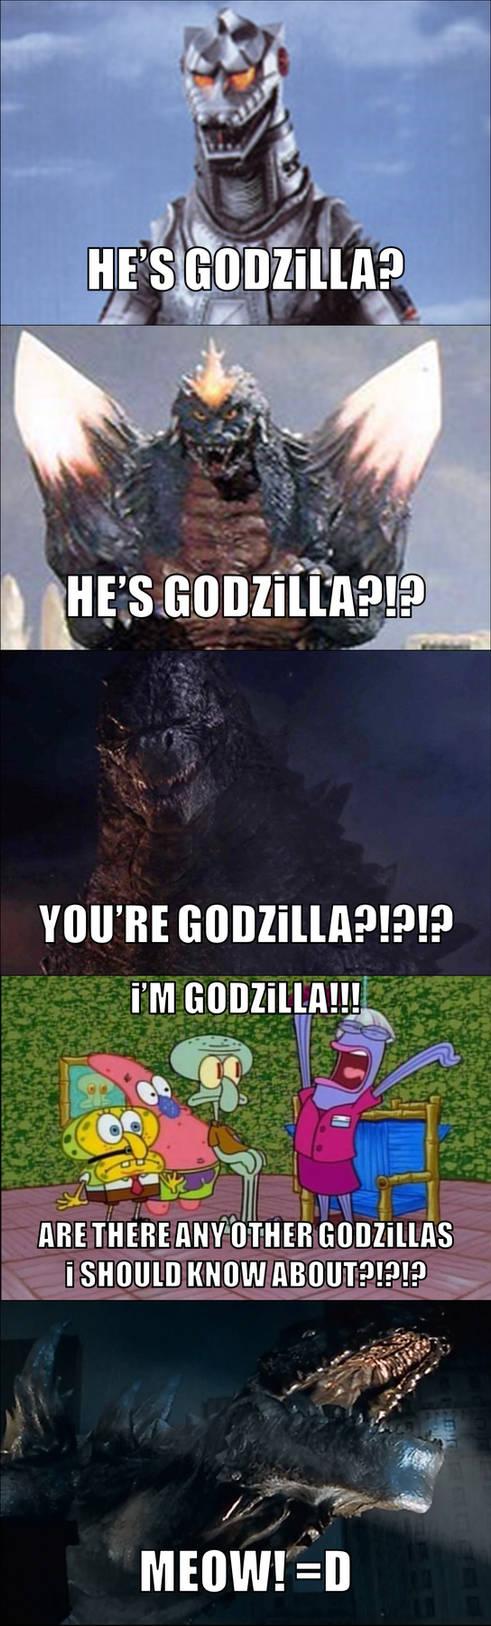 Godzilla, Mechagodzilla And SpaceGodzilla! (Funny)